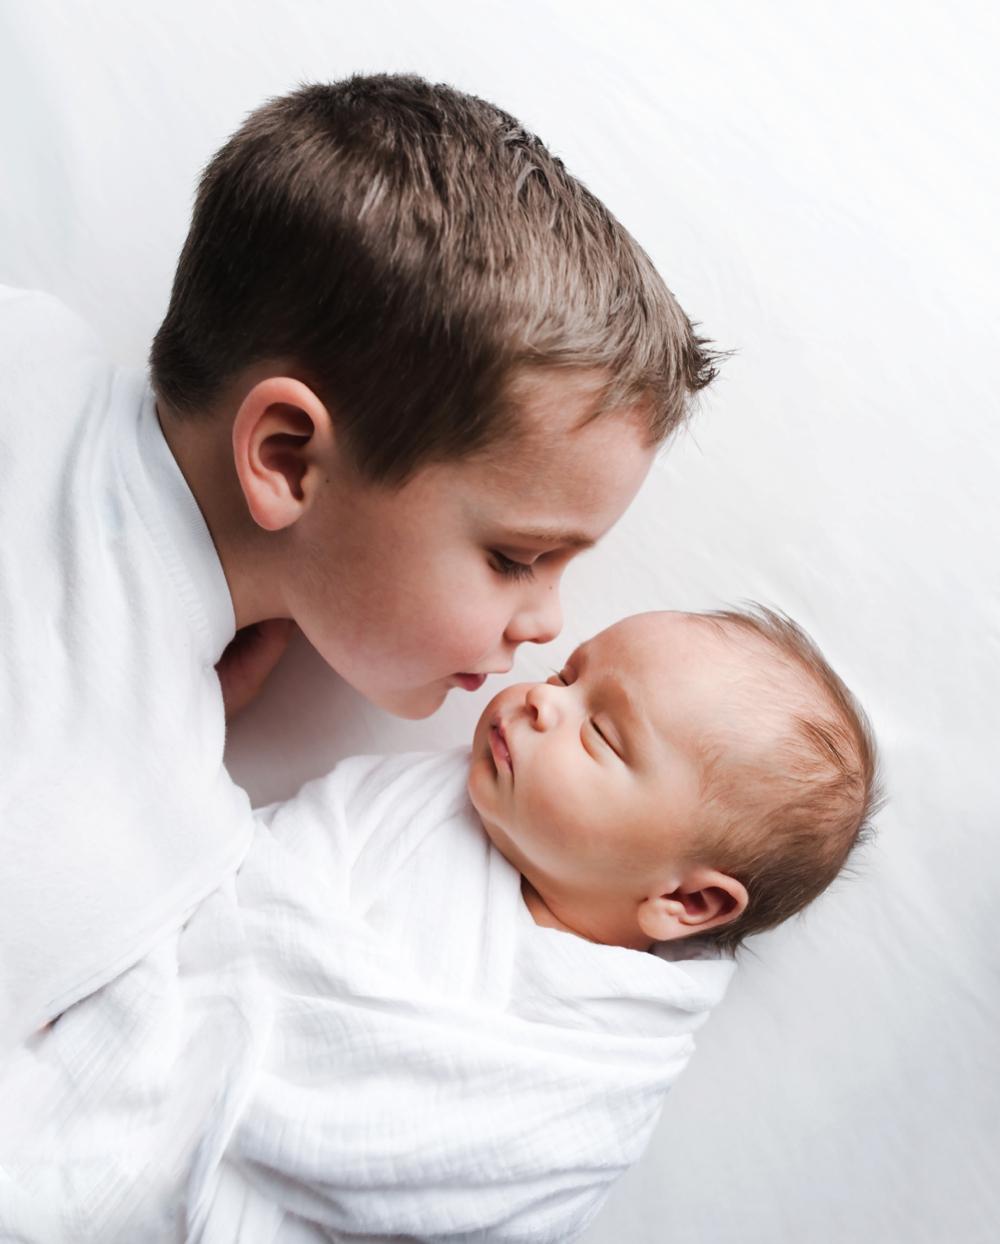 Baby-Ryan-Newborn-Session-Indy-Family-Photo_0013.jpg